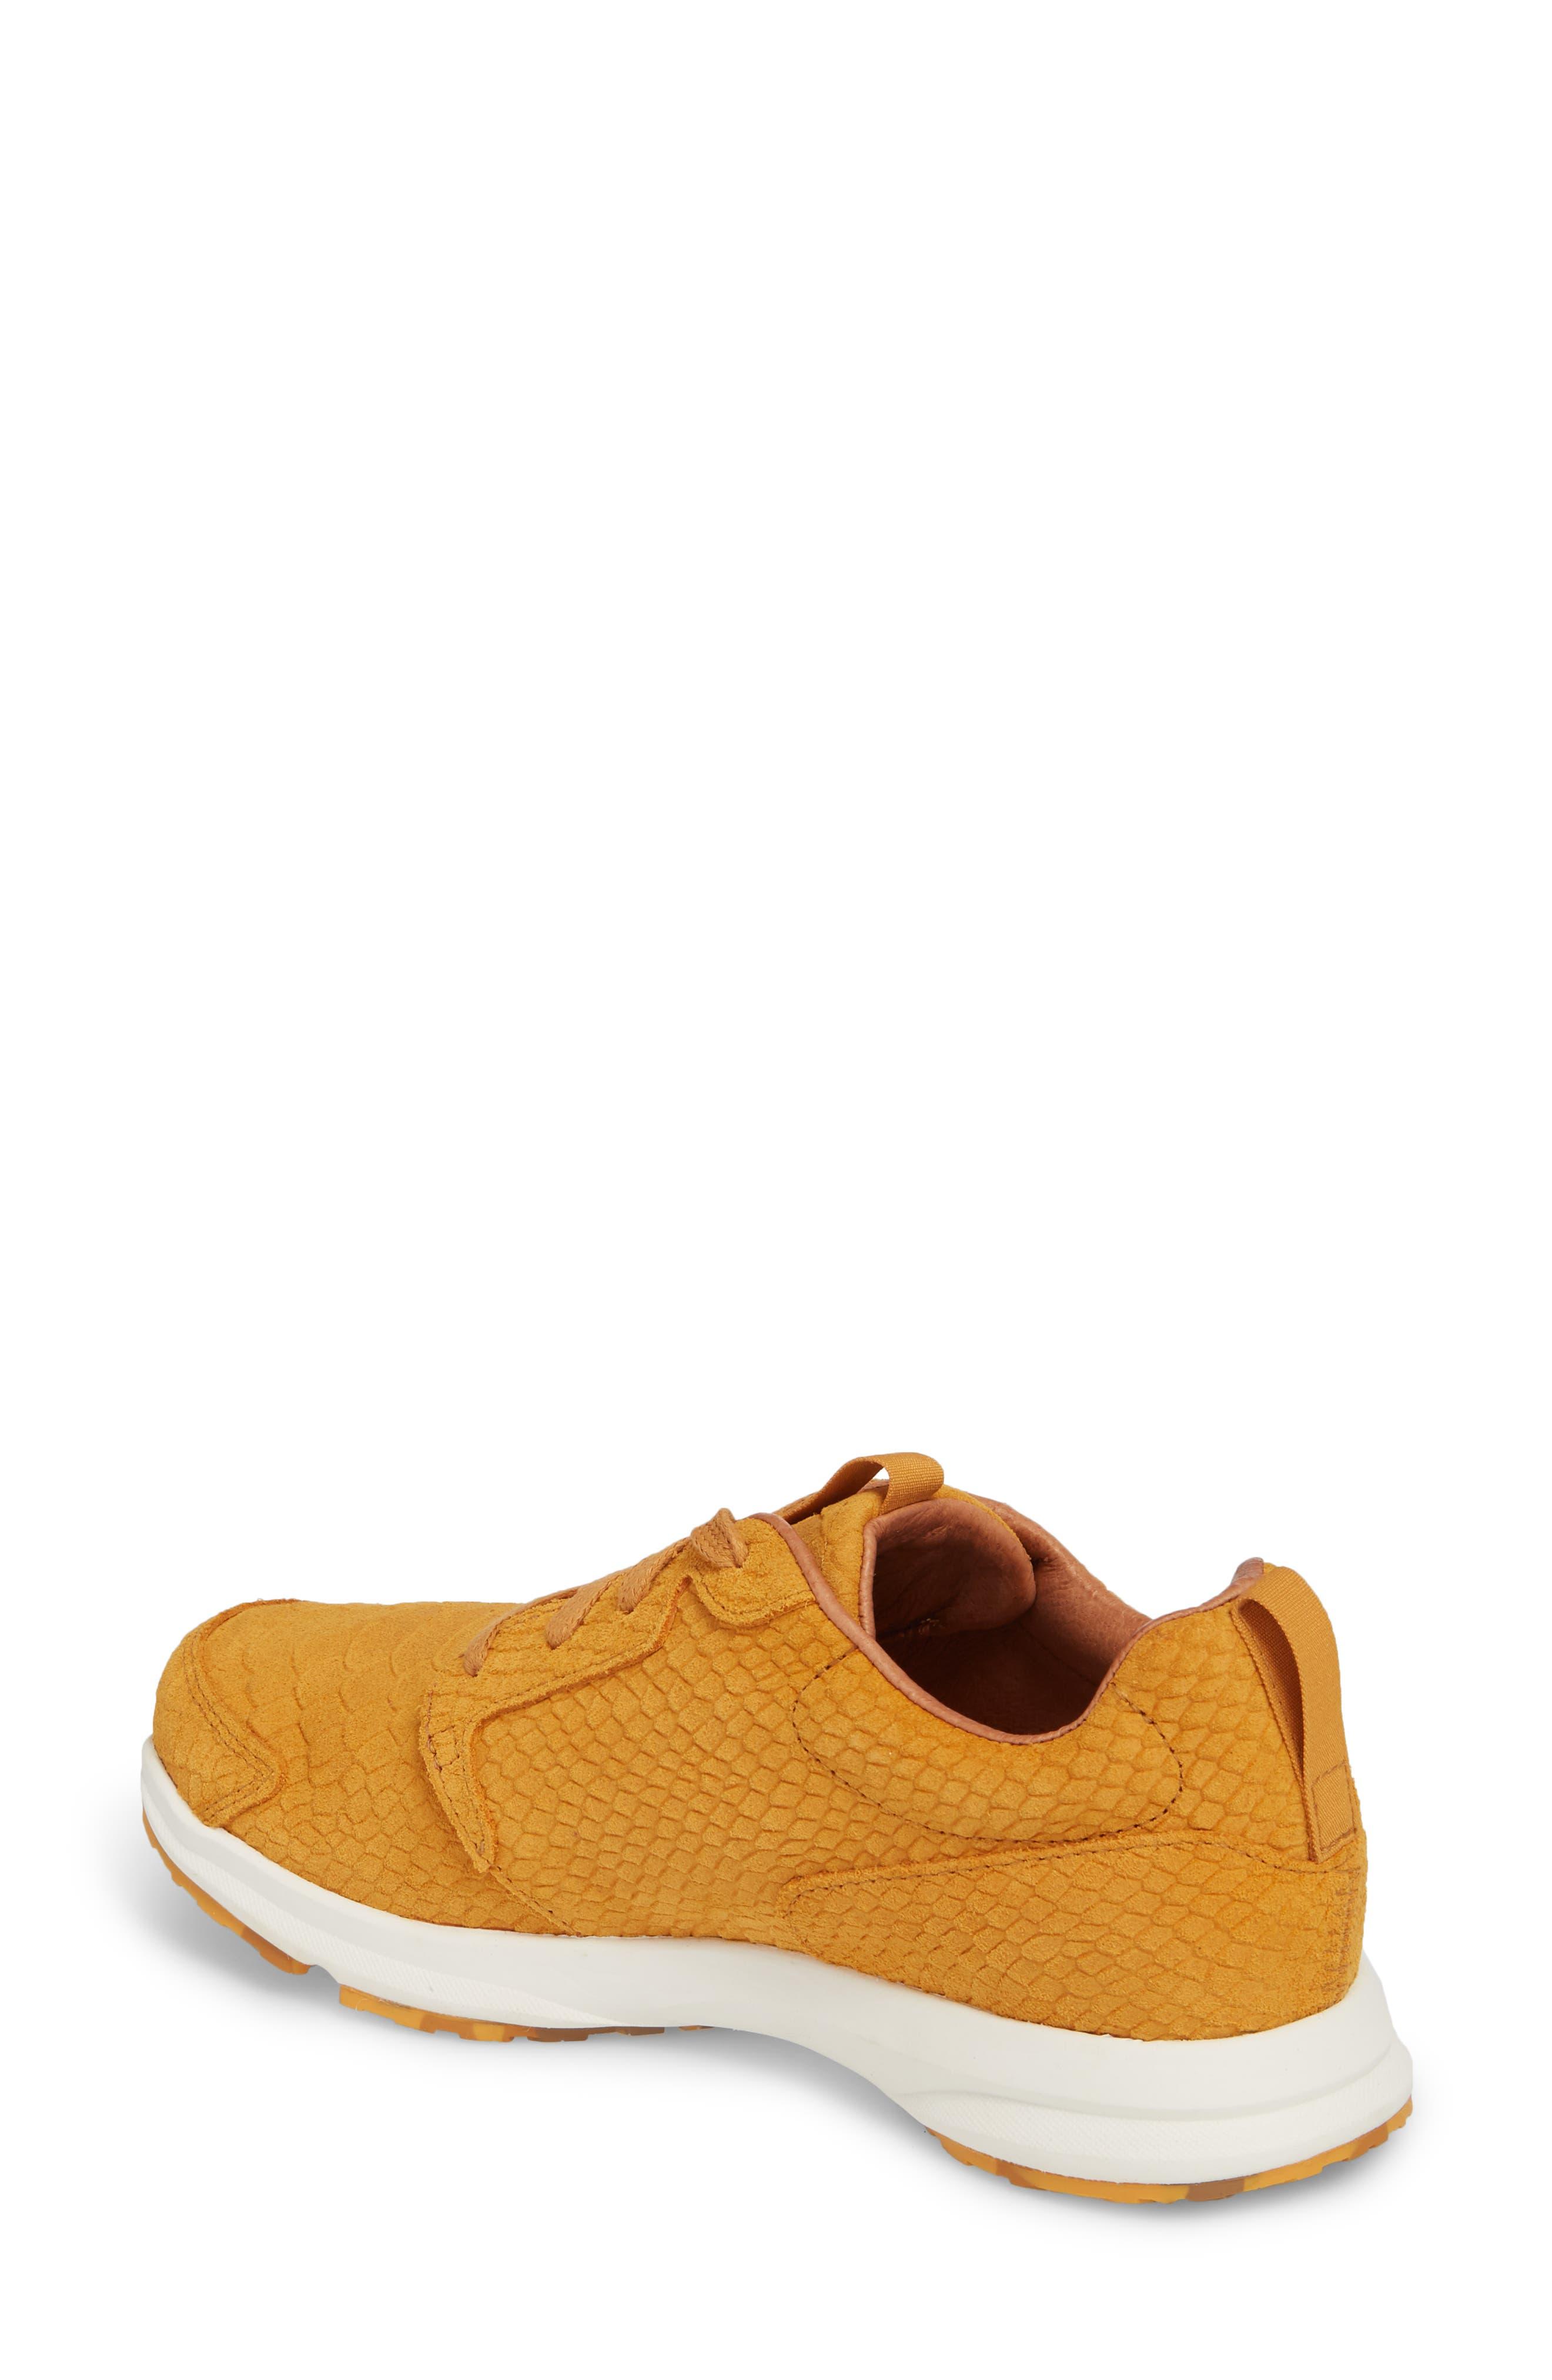 Fusion Sneaker,                             Alternate thumbnail 2, color,                             700